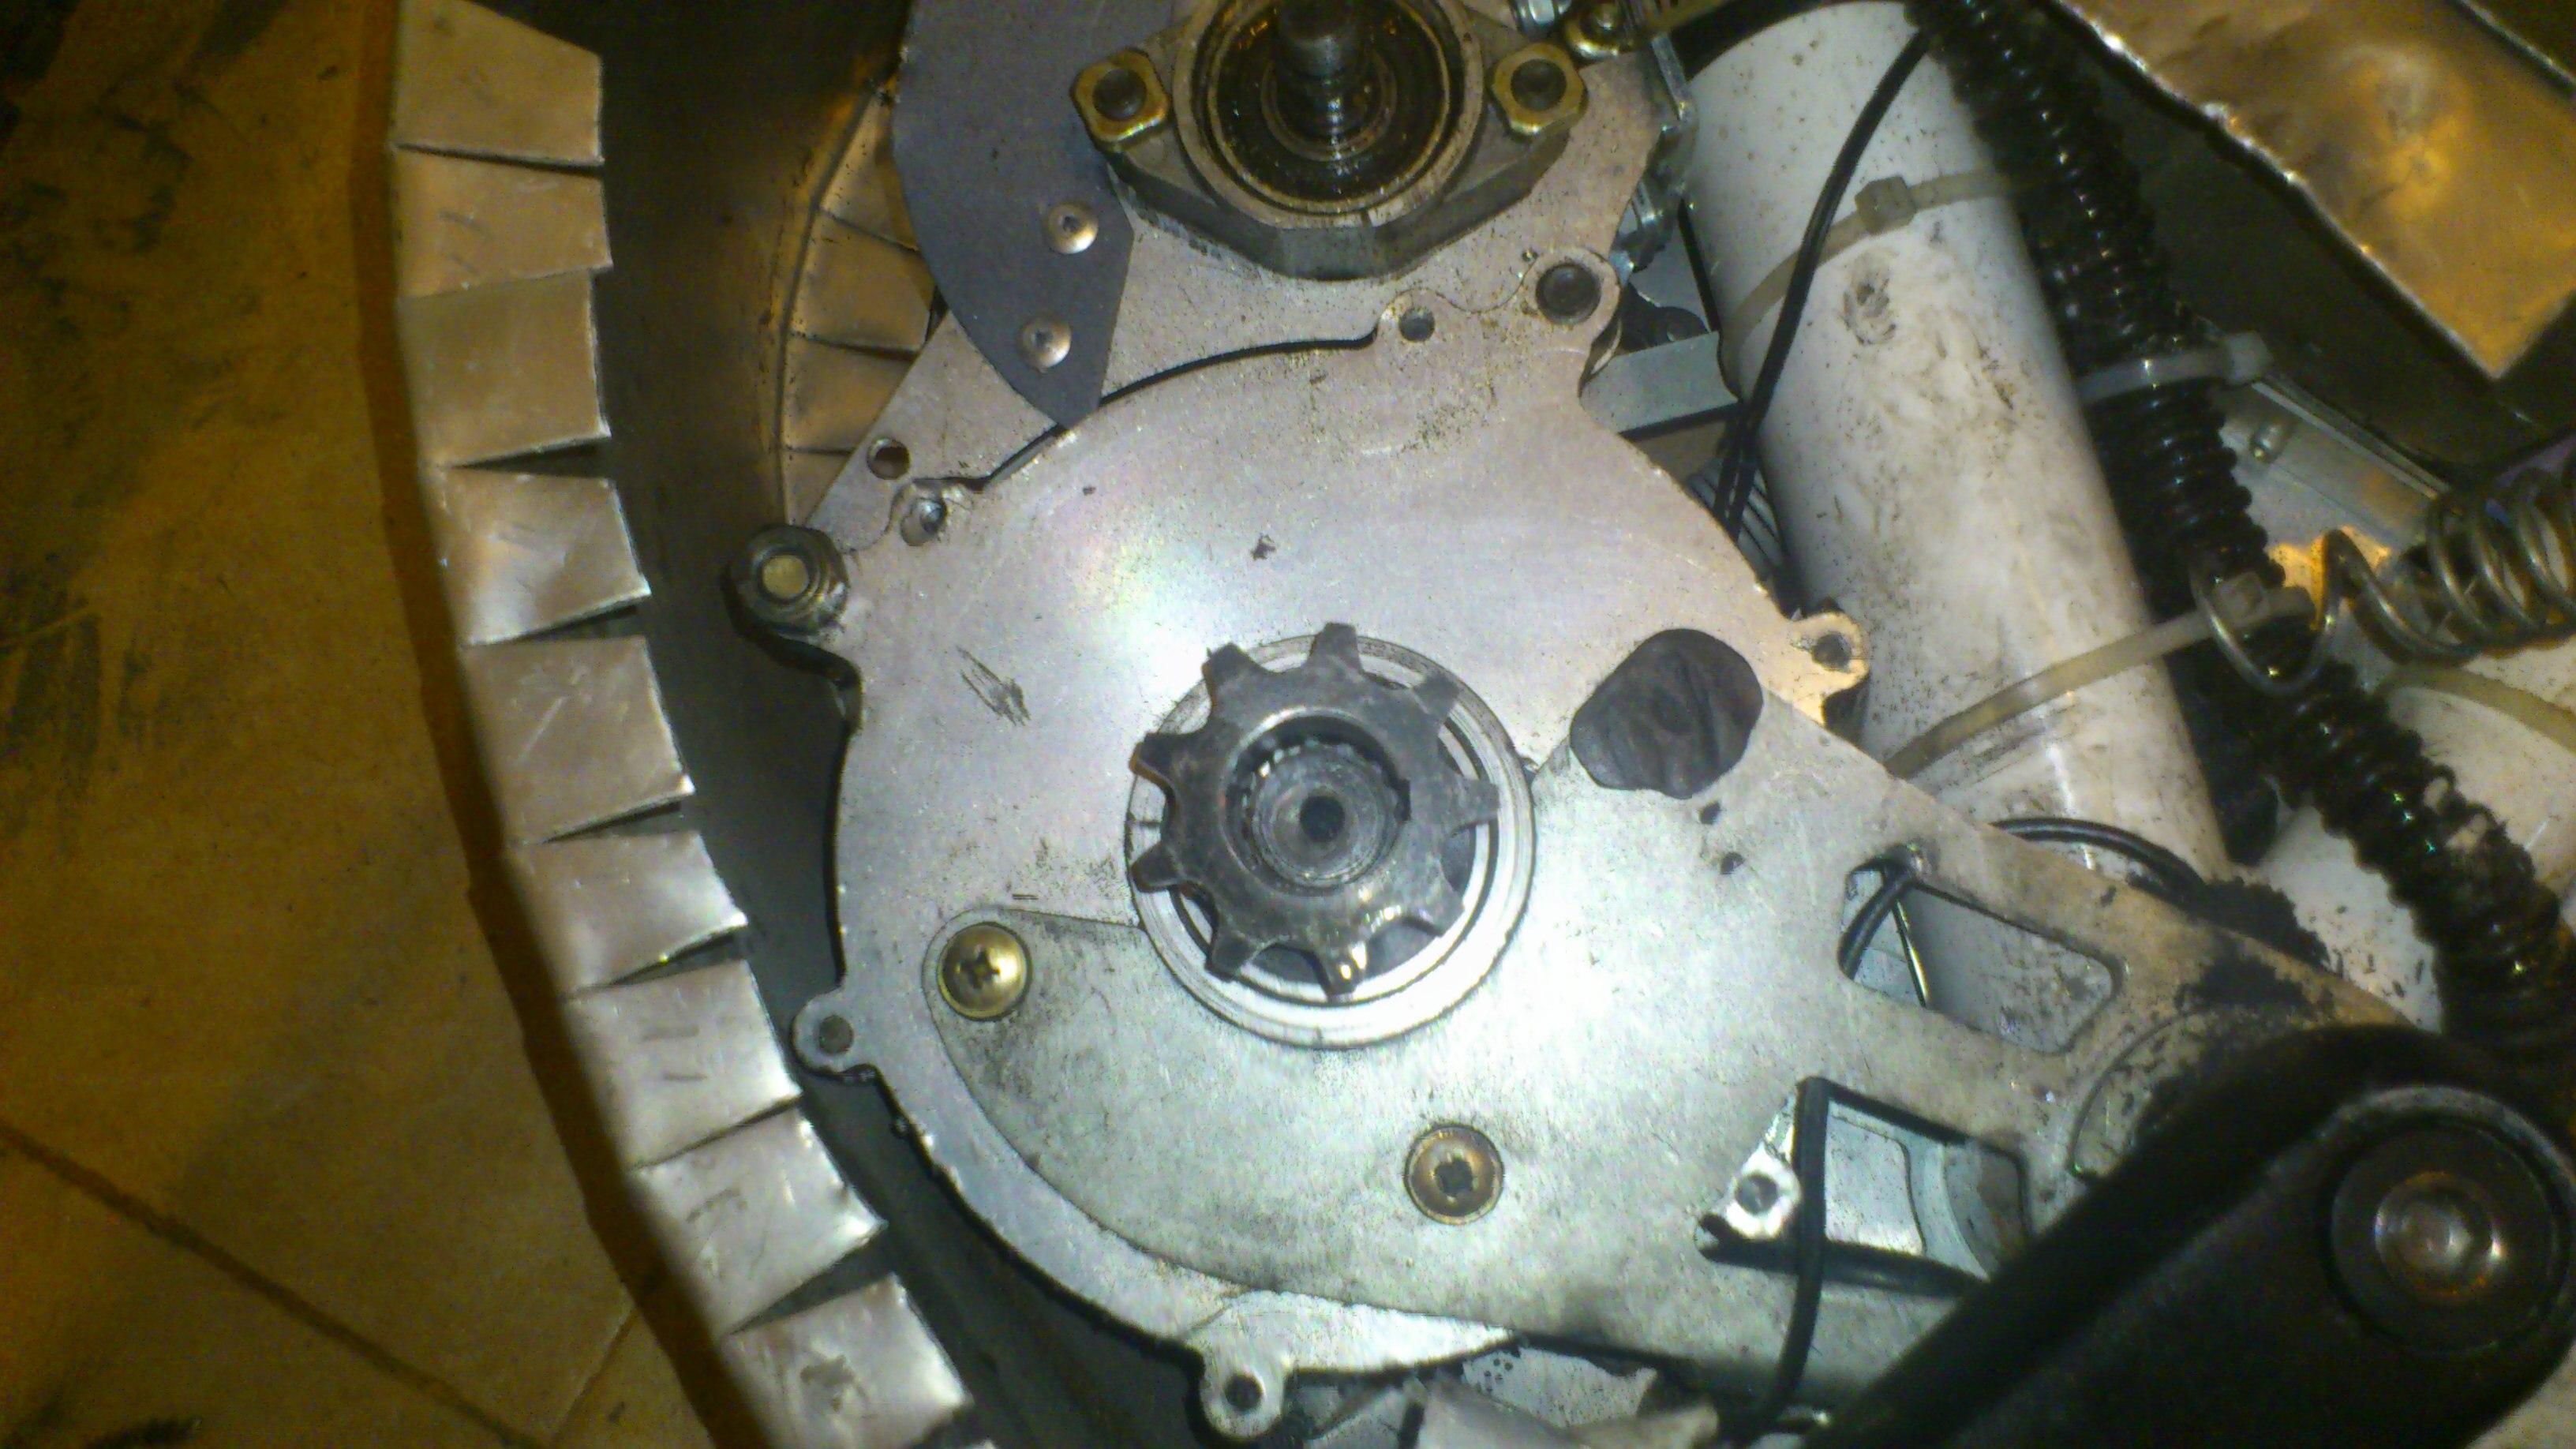 motor shaft after matching